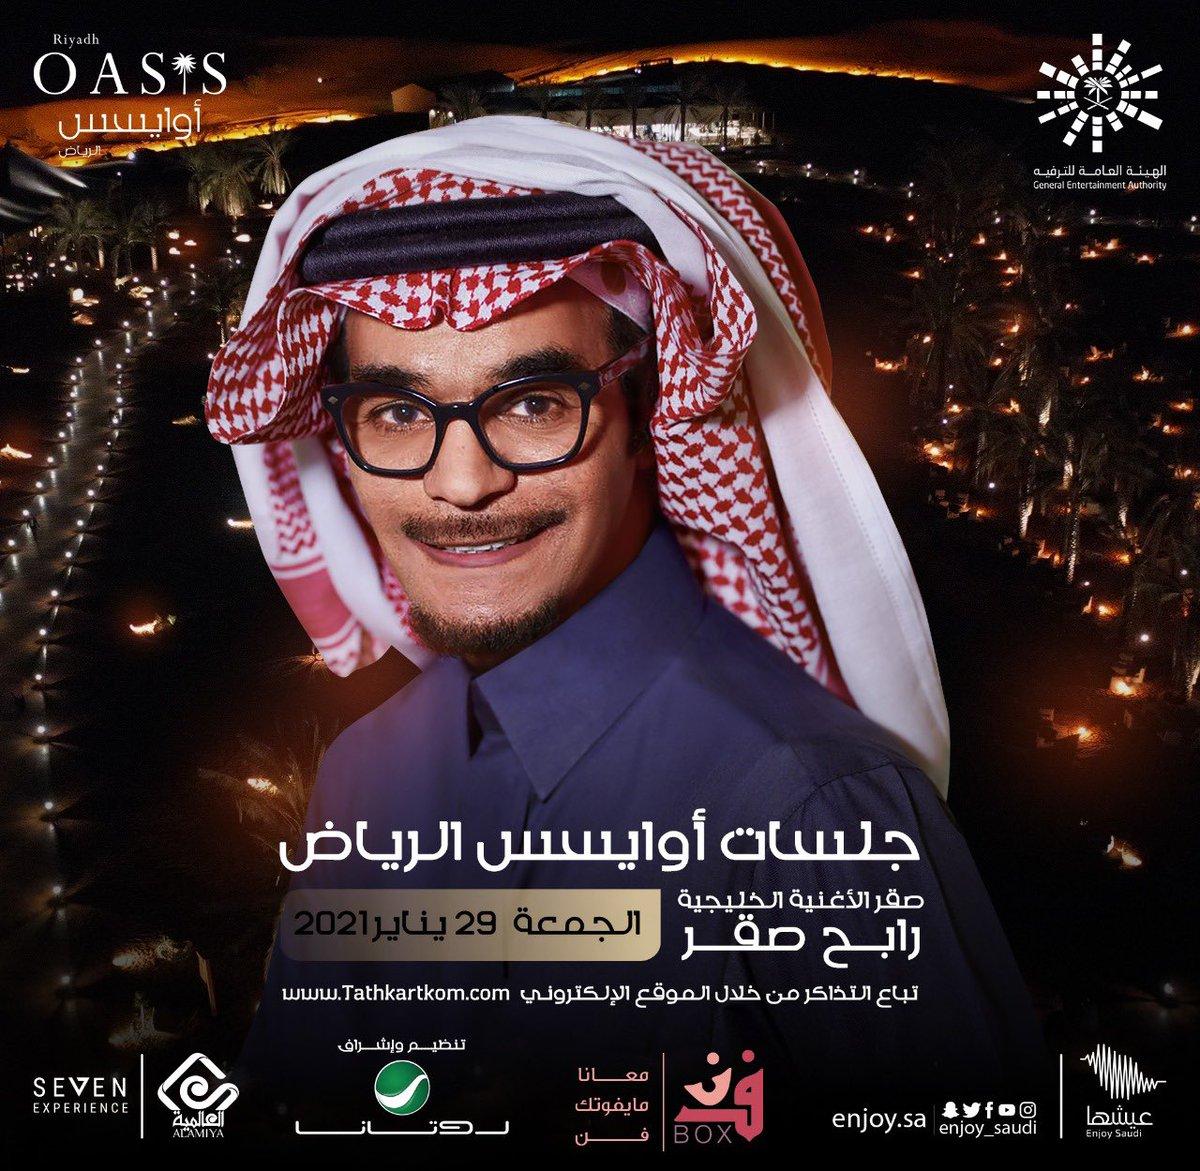 Replying to @Turki_alalshikh: الموسيقار الكبير رابح صقر قريباً 🇸🇦🔥🙏🏻❤️ في الرياض اوايسس 👏🏻🔥